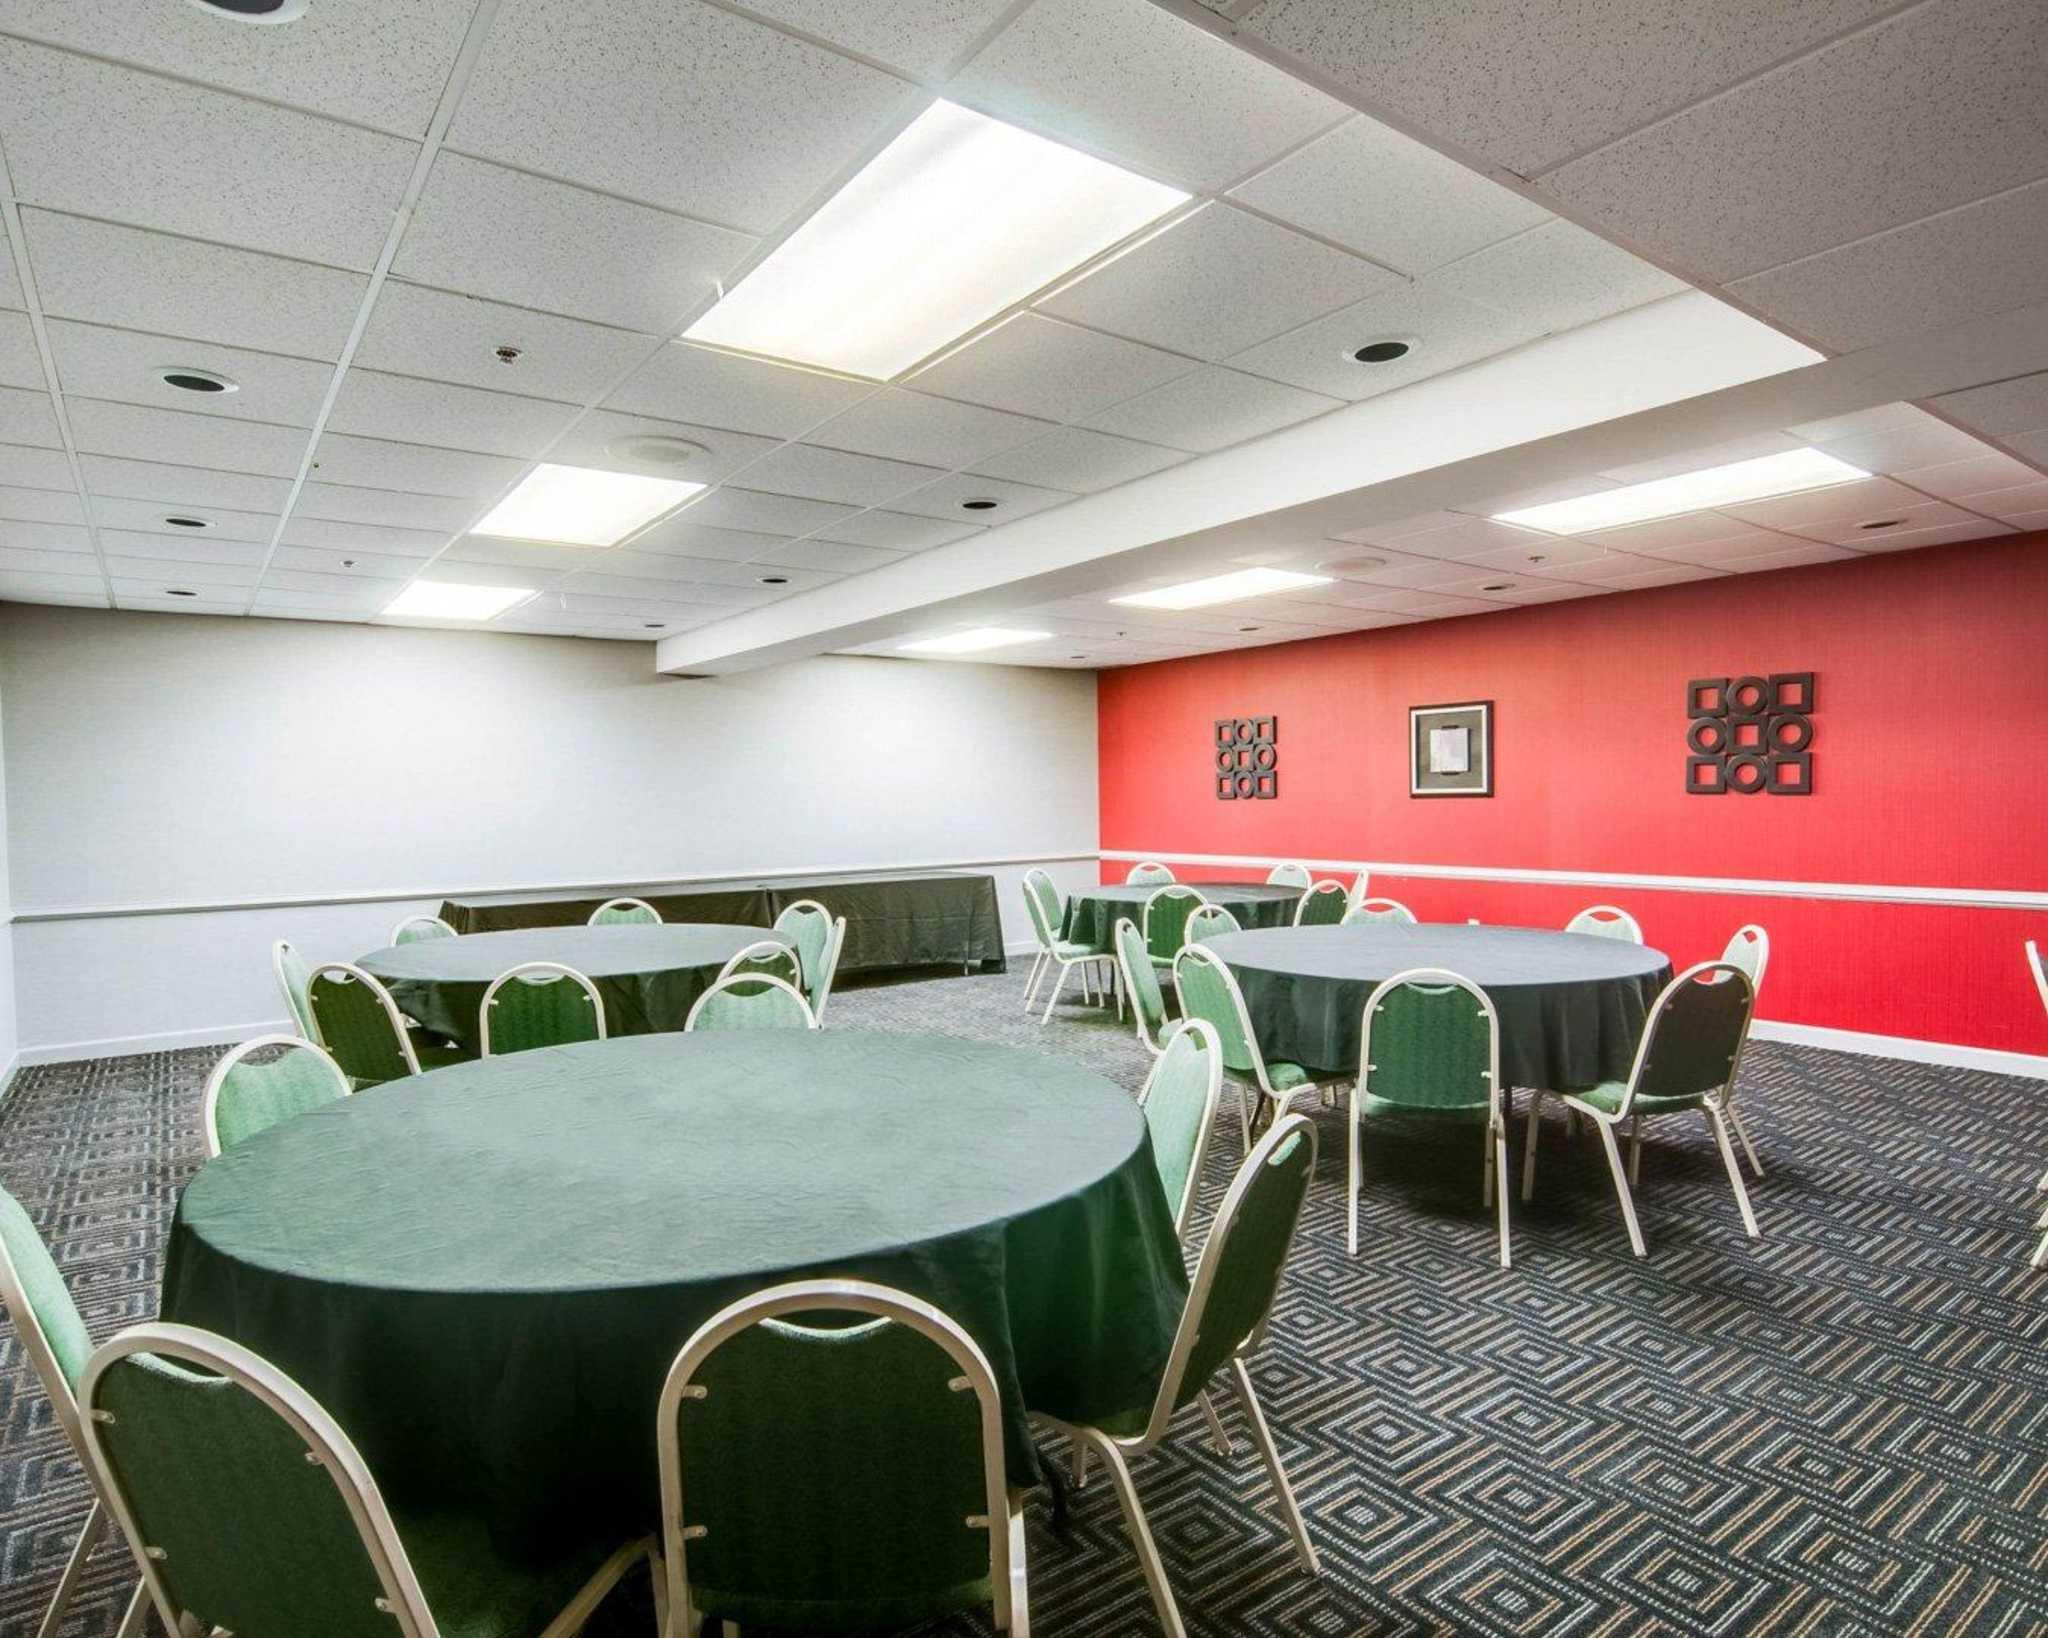 Comfort Suites Inn at Ridgewood Farm image 16